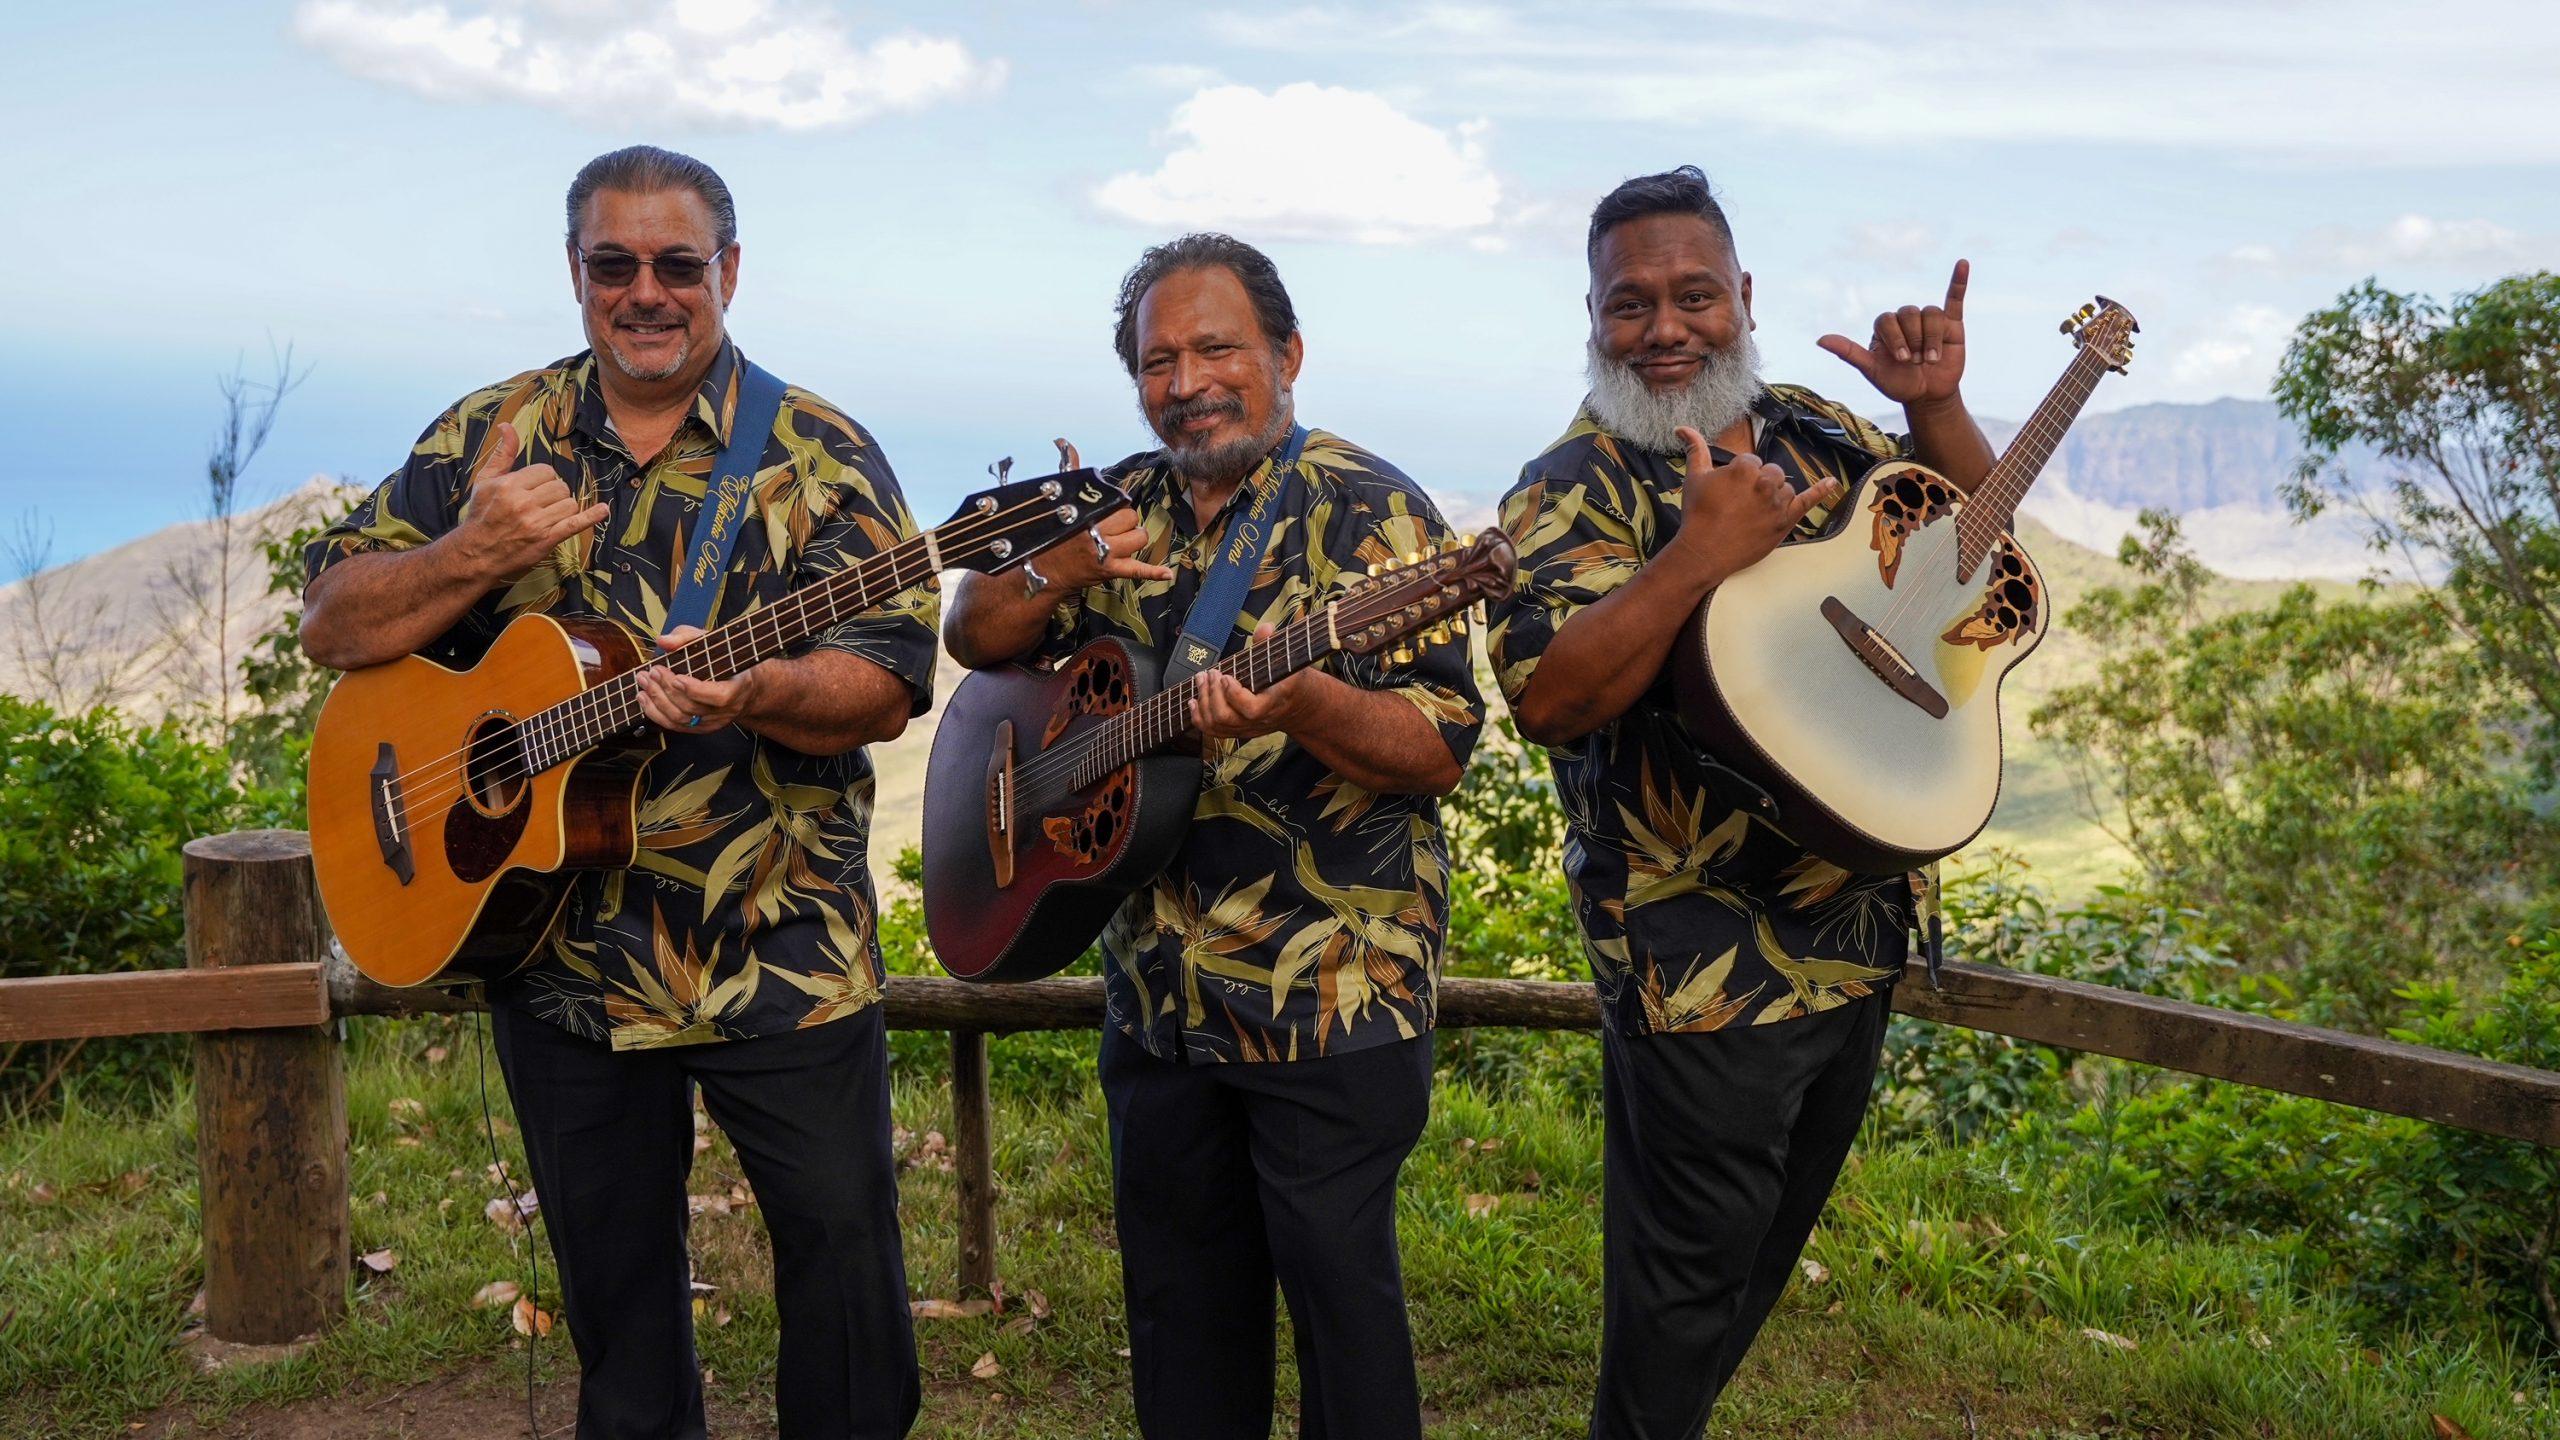 Local Musicians Perform Online Concert Aug. 7 To Benefit Hawaiʻi's School Teachers